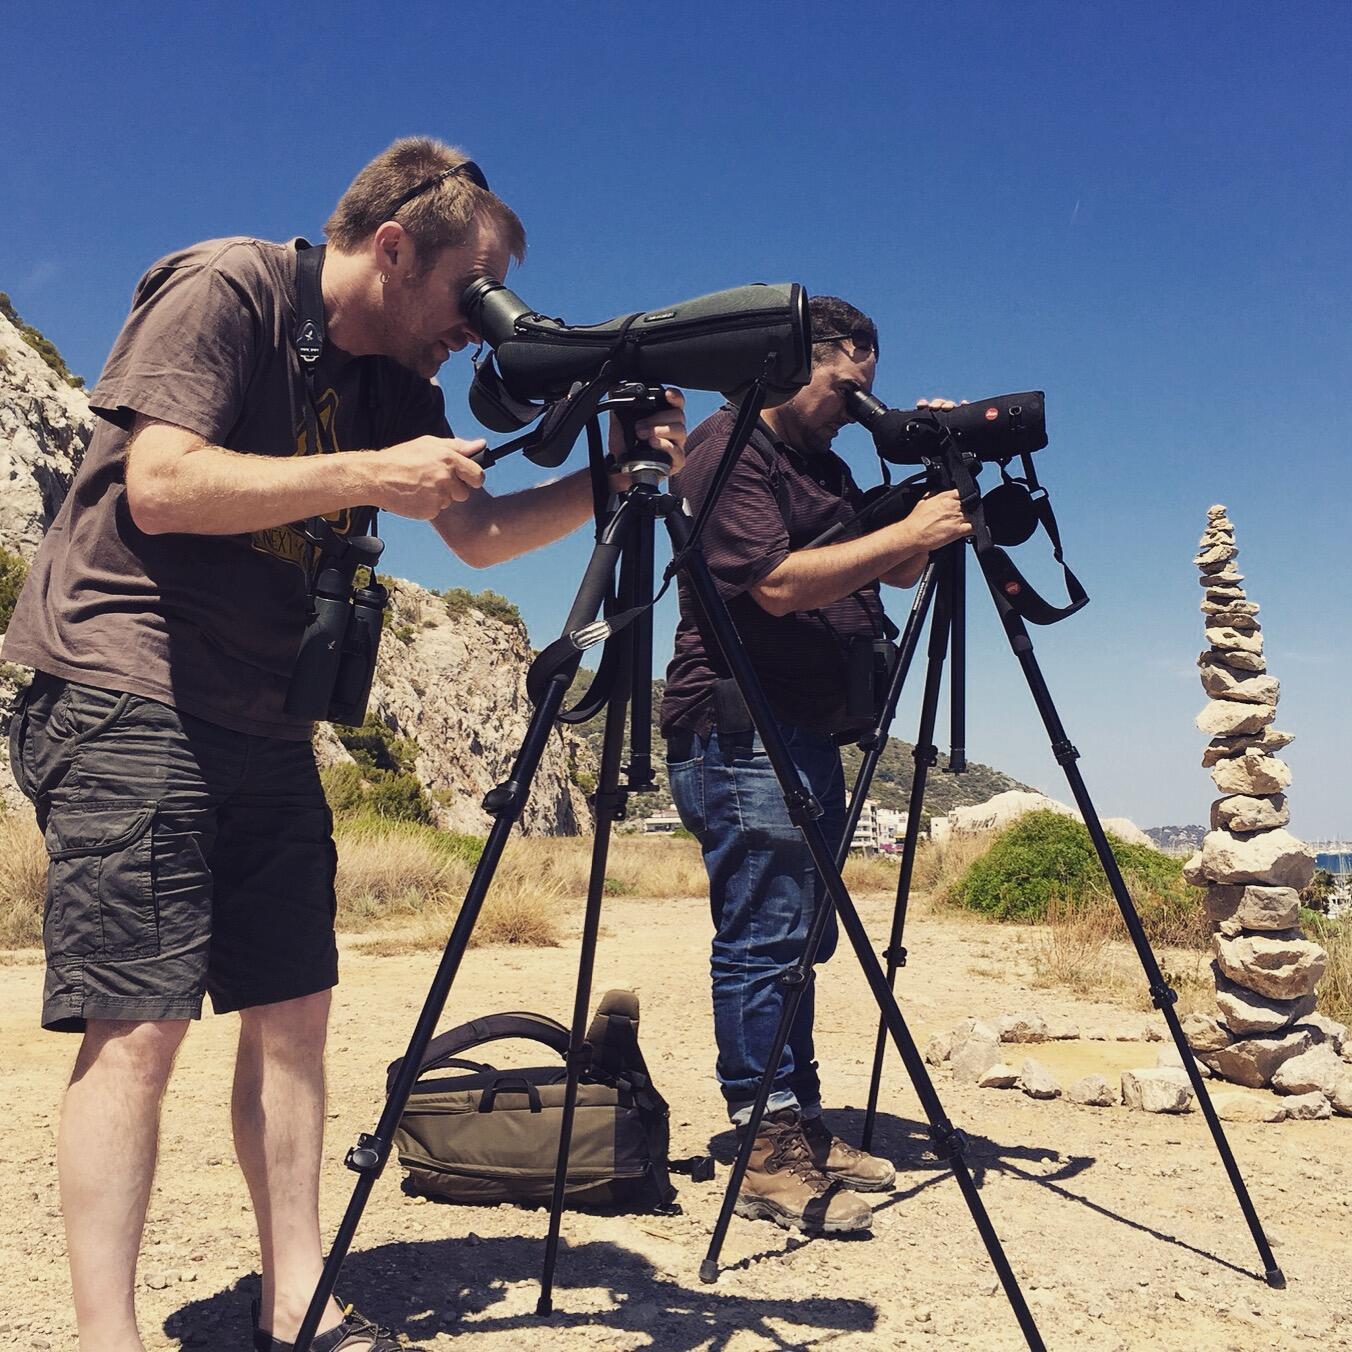 Gorka and Ricard scope for birds. Noah Strycker